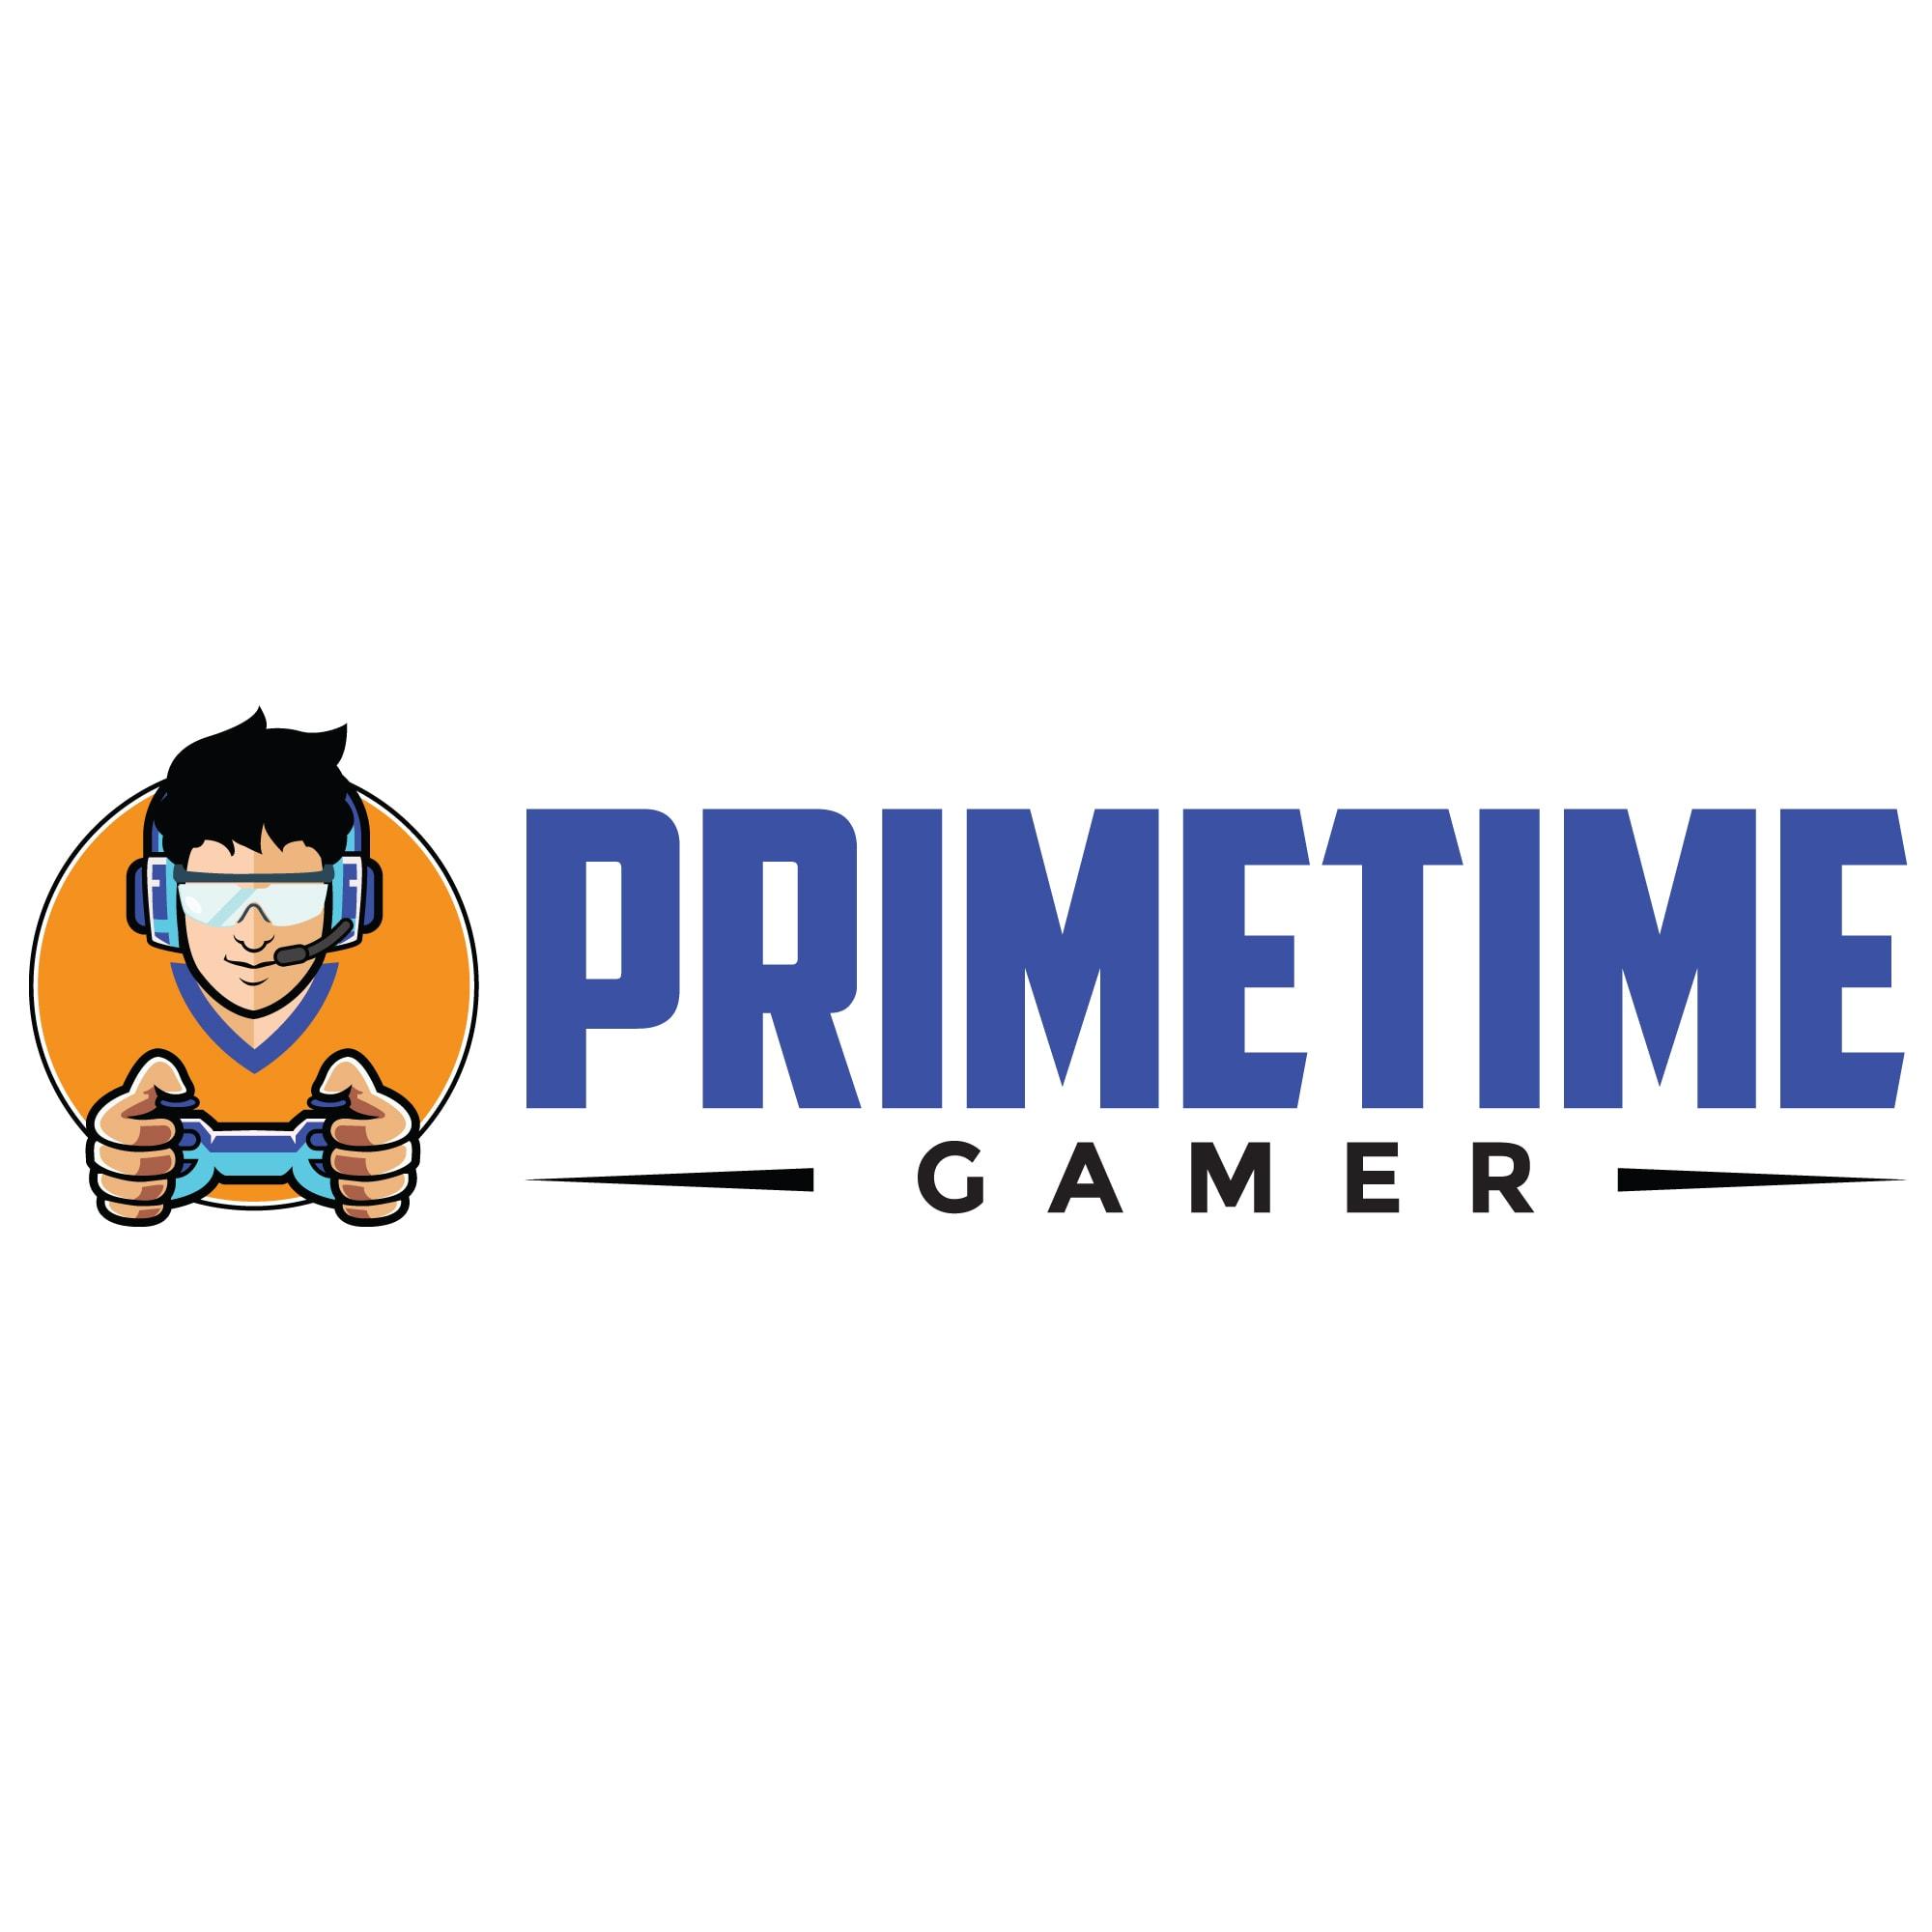 Primetimegamer.com